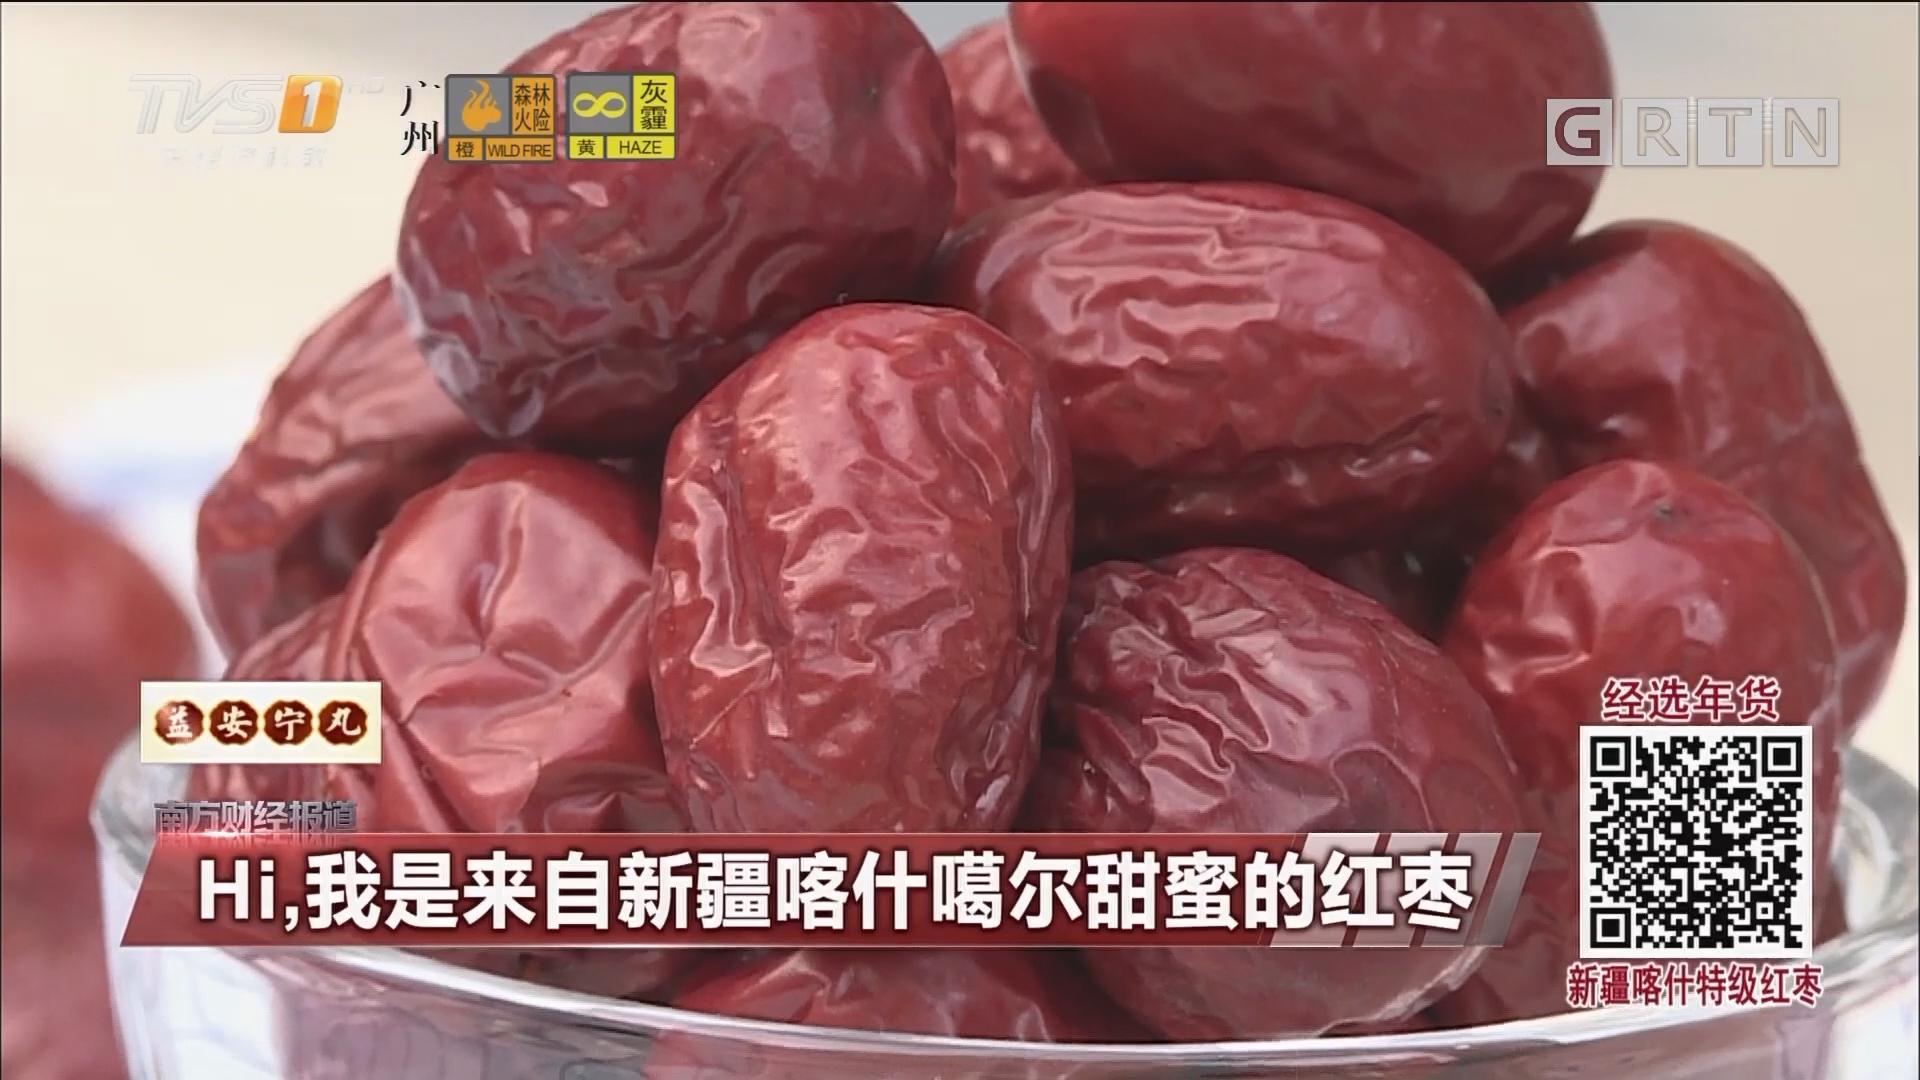 Hi,我是来自新疆喀什噶尔甜蜜的红枣